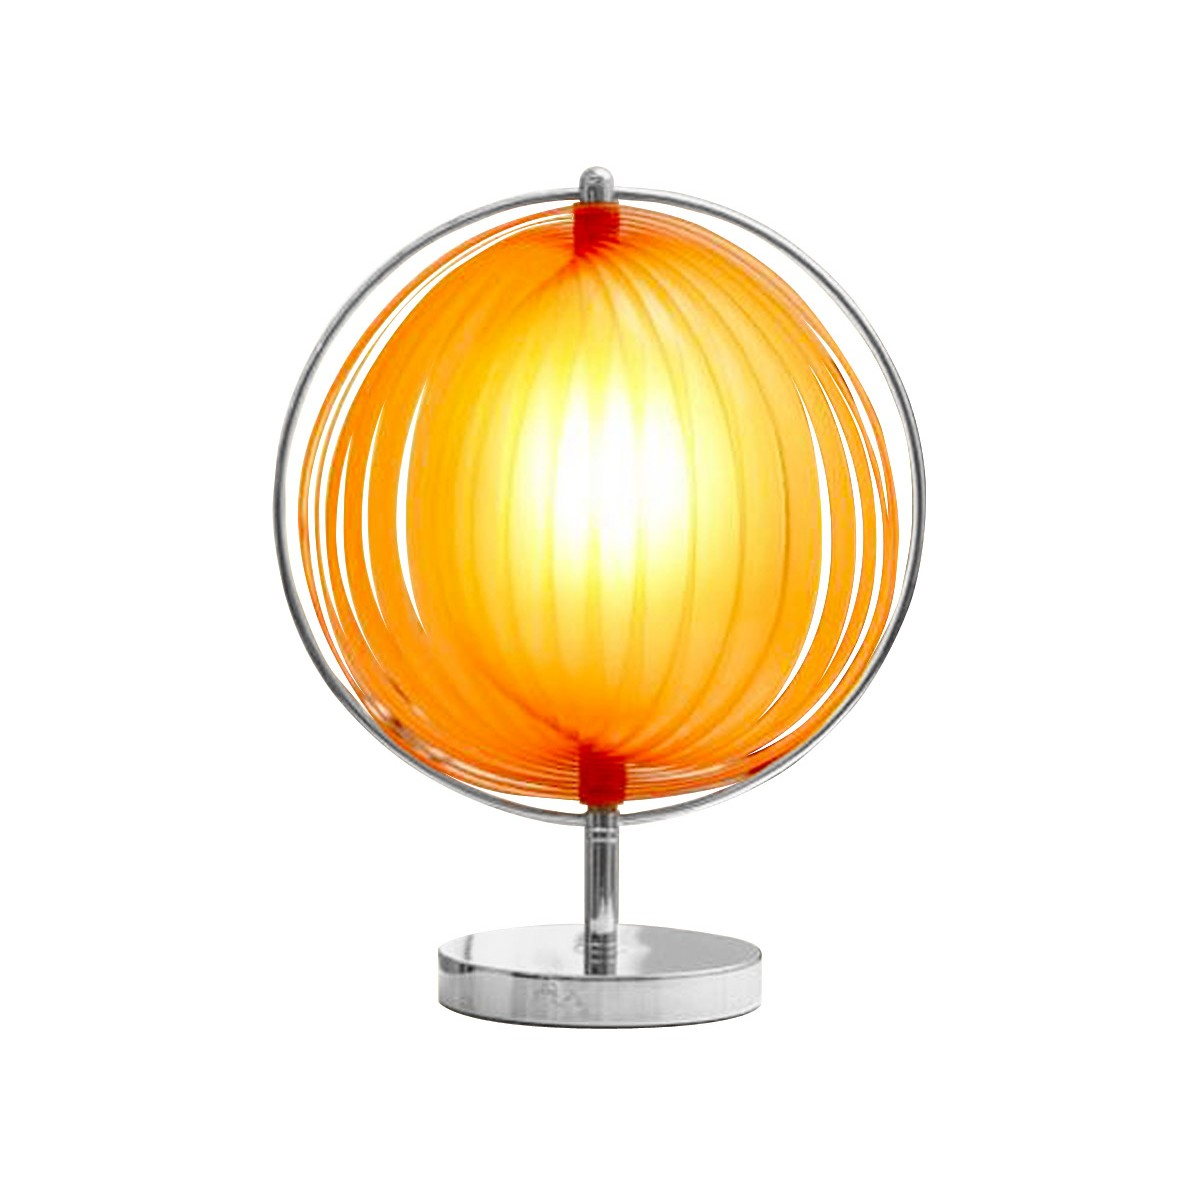 lampe de table design beche small en m tal orange fran ais french. Black Bedroom Furniture Sets. Home Design Ideas